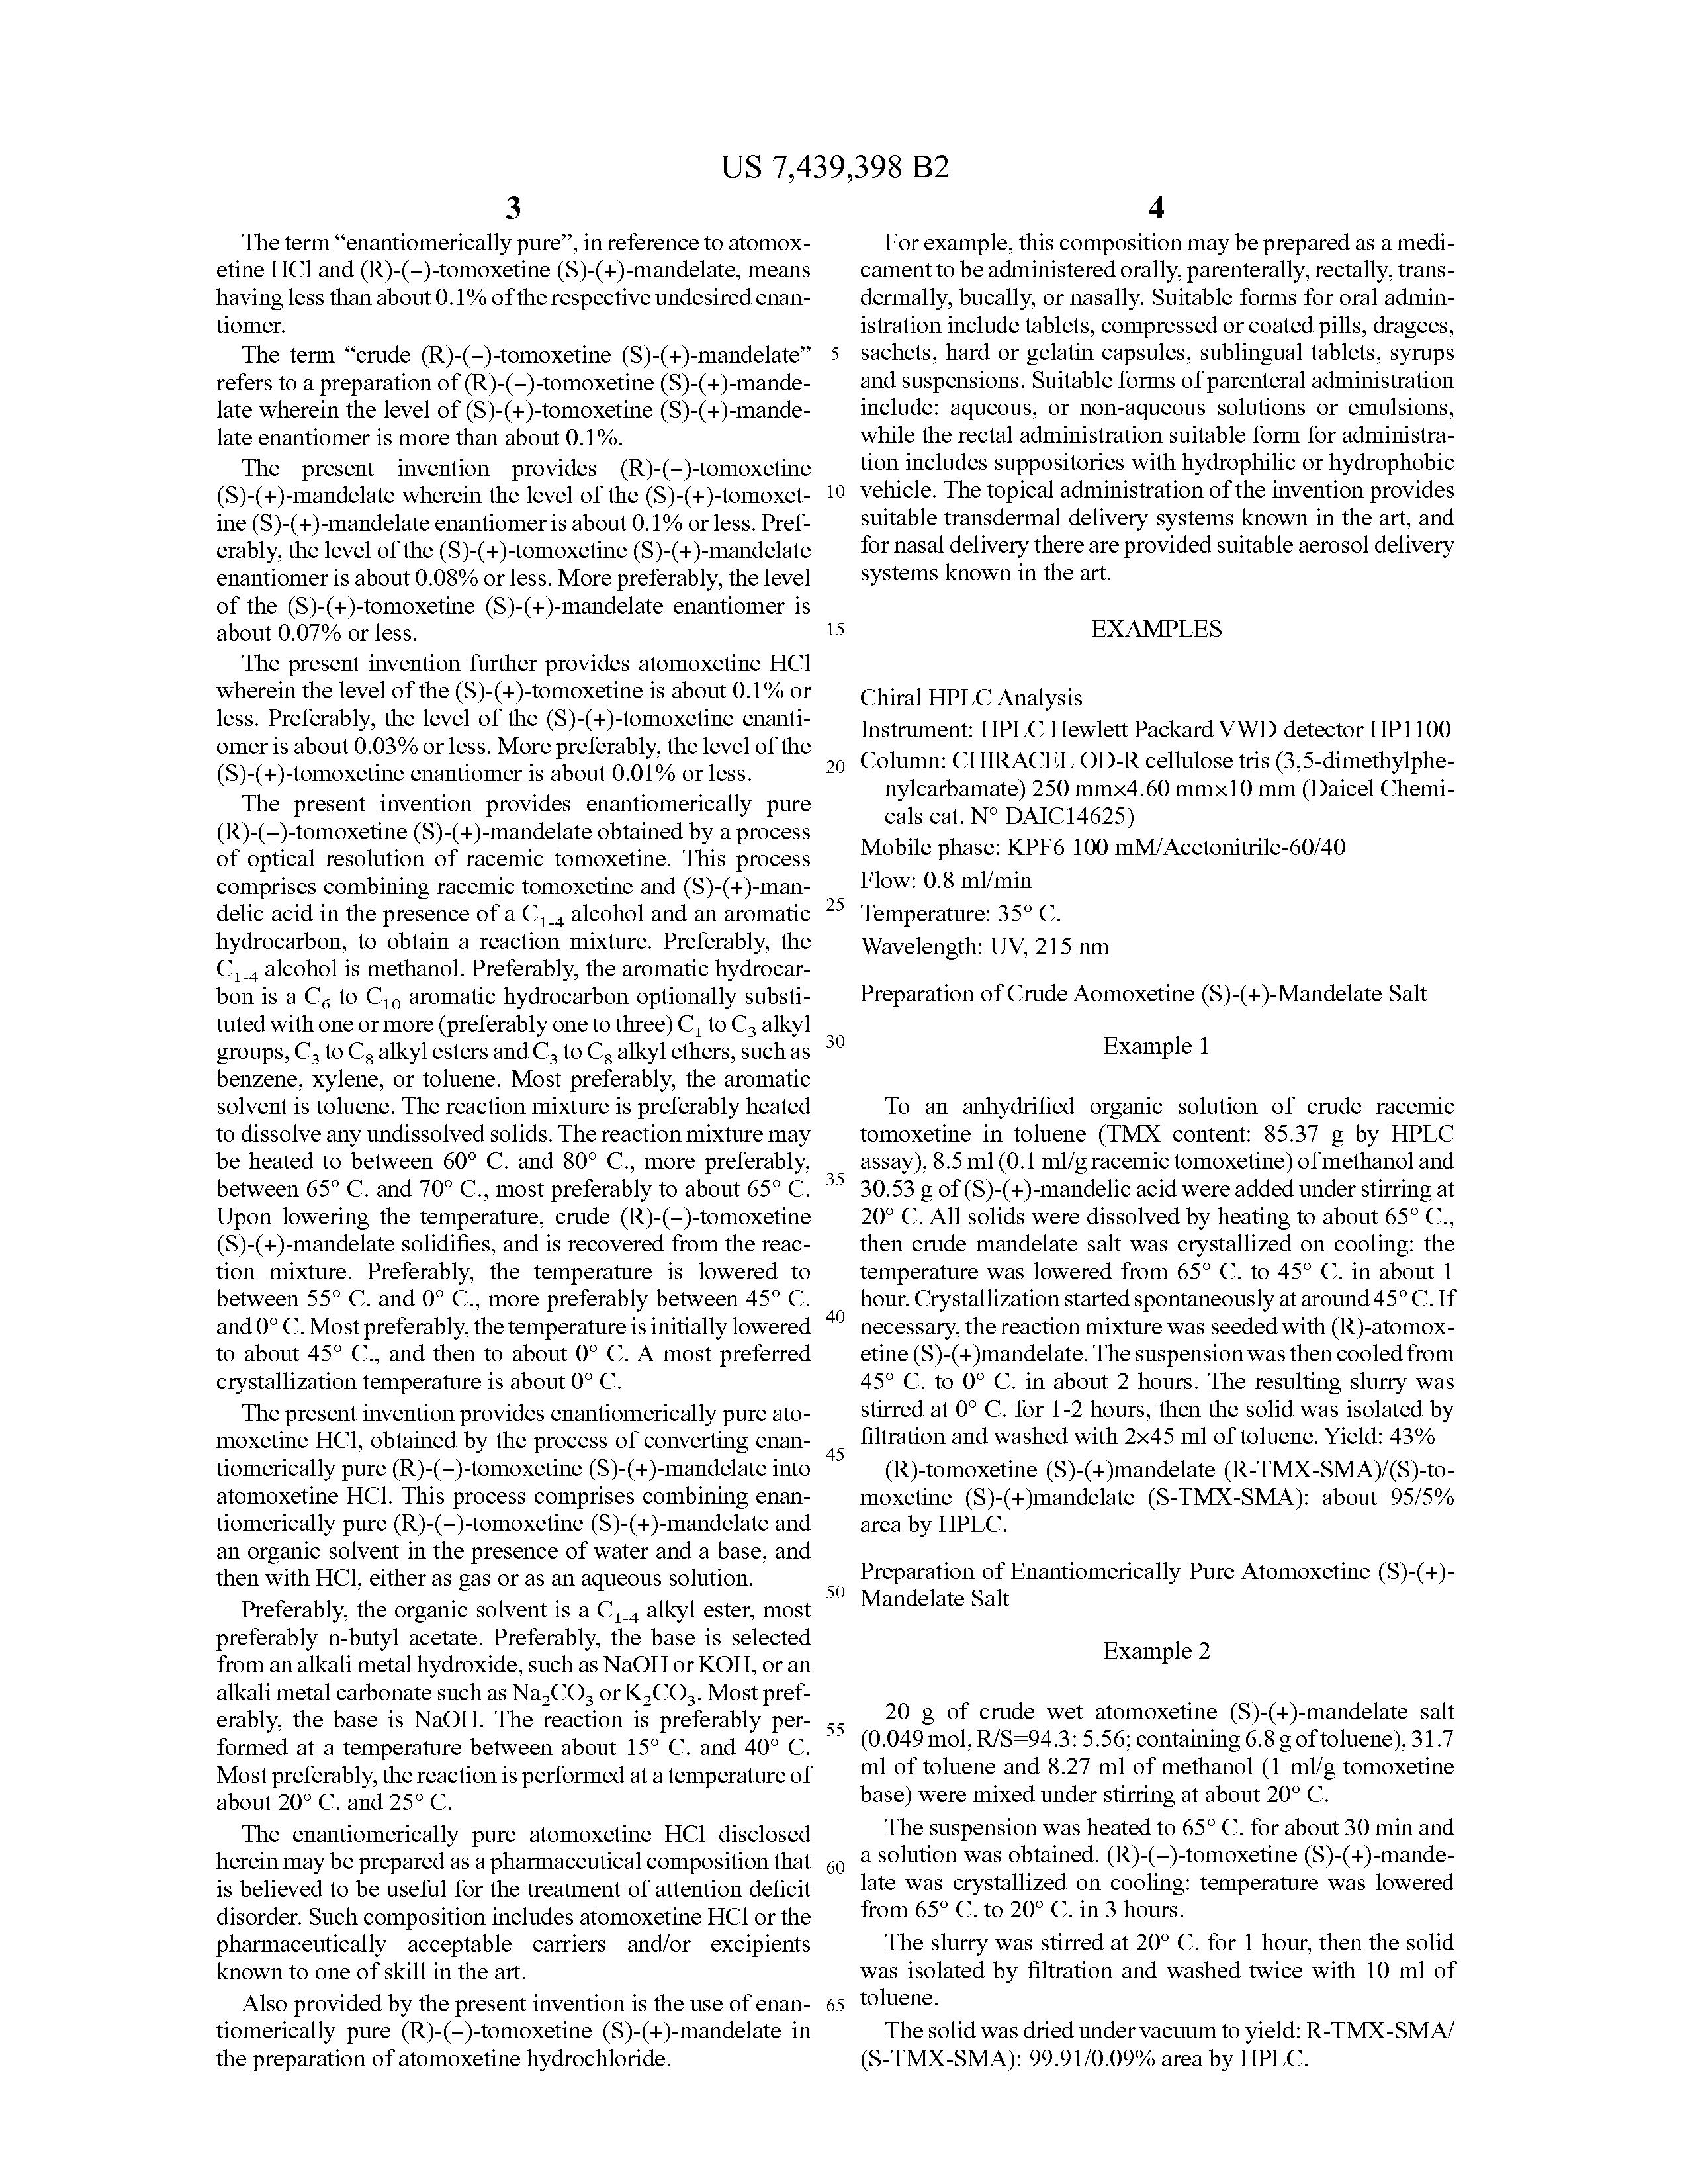 Atomoxetine Hydrochloride Patent